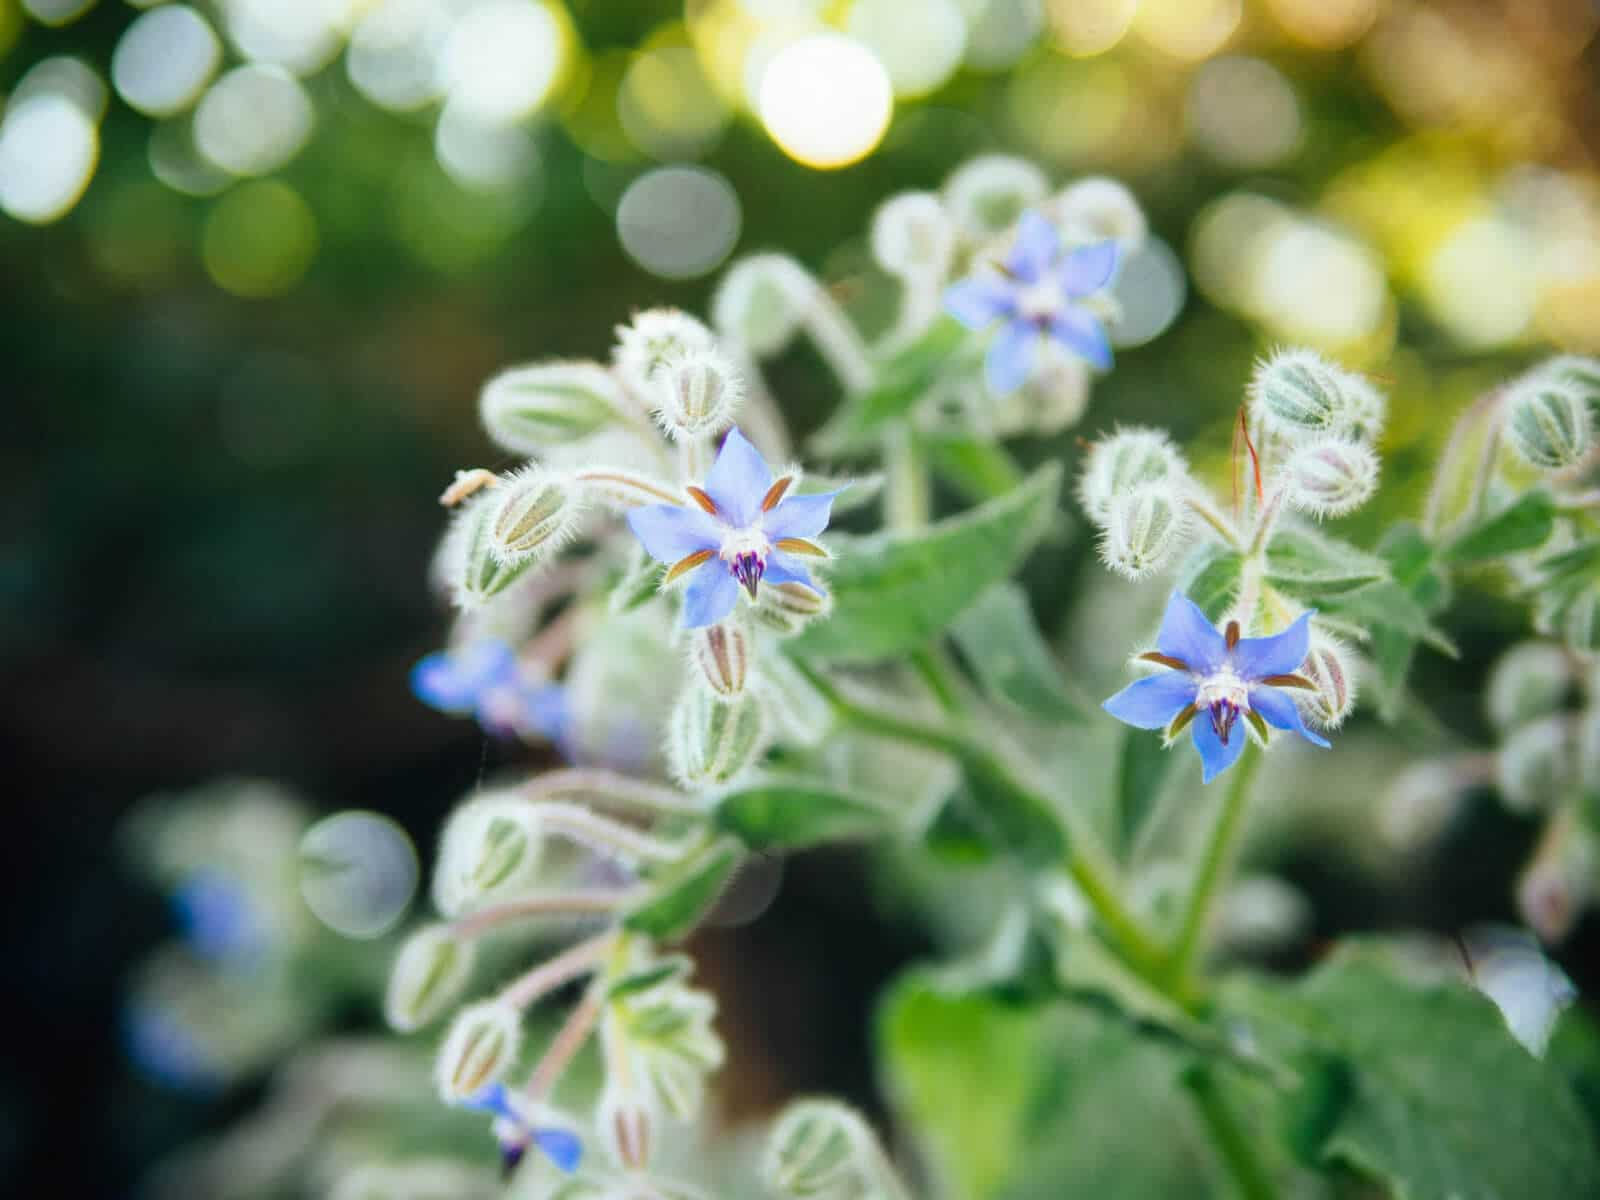 Star-shaped borage flowers